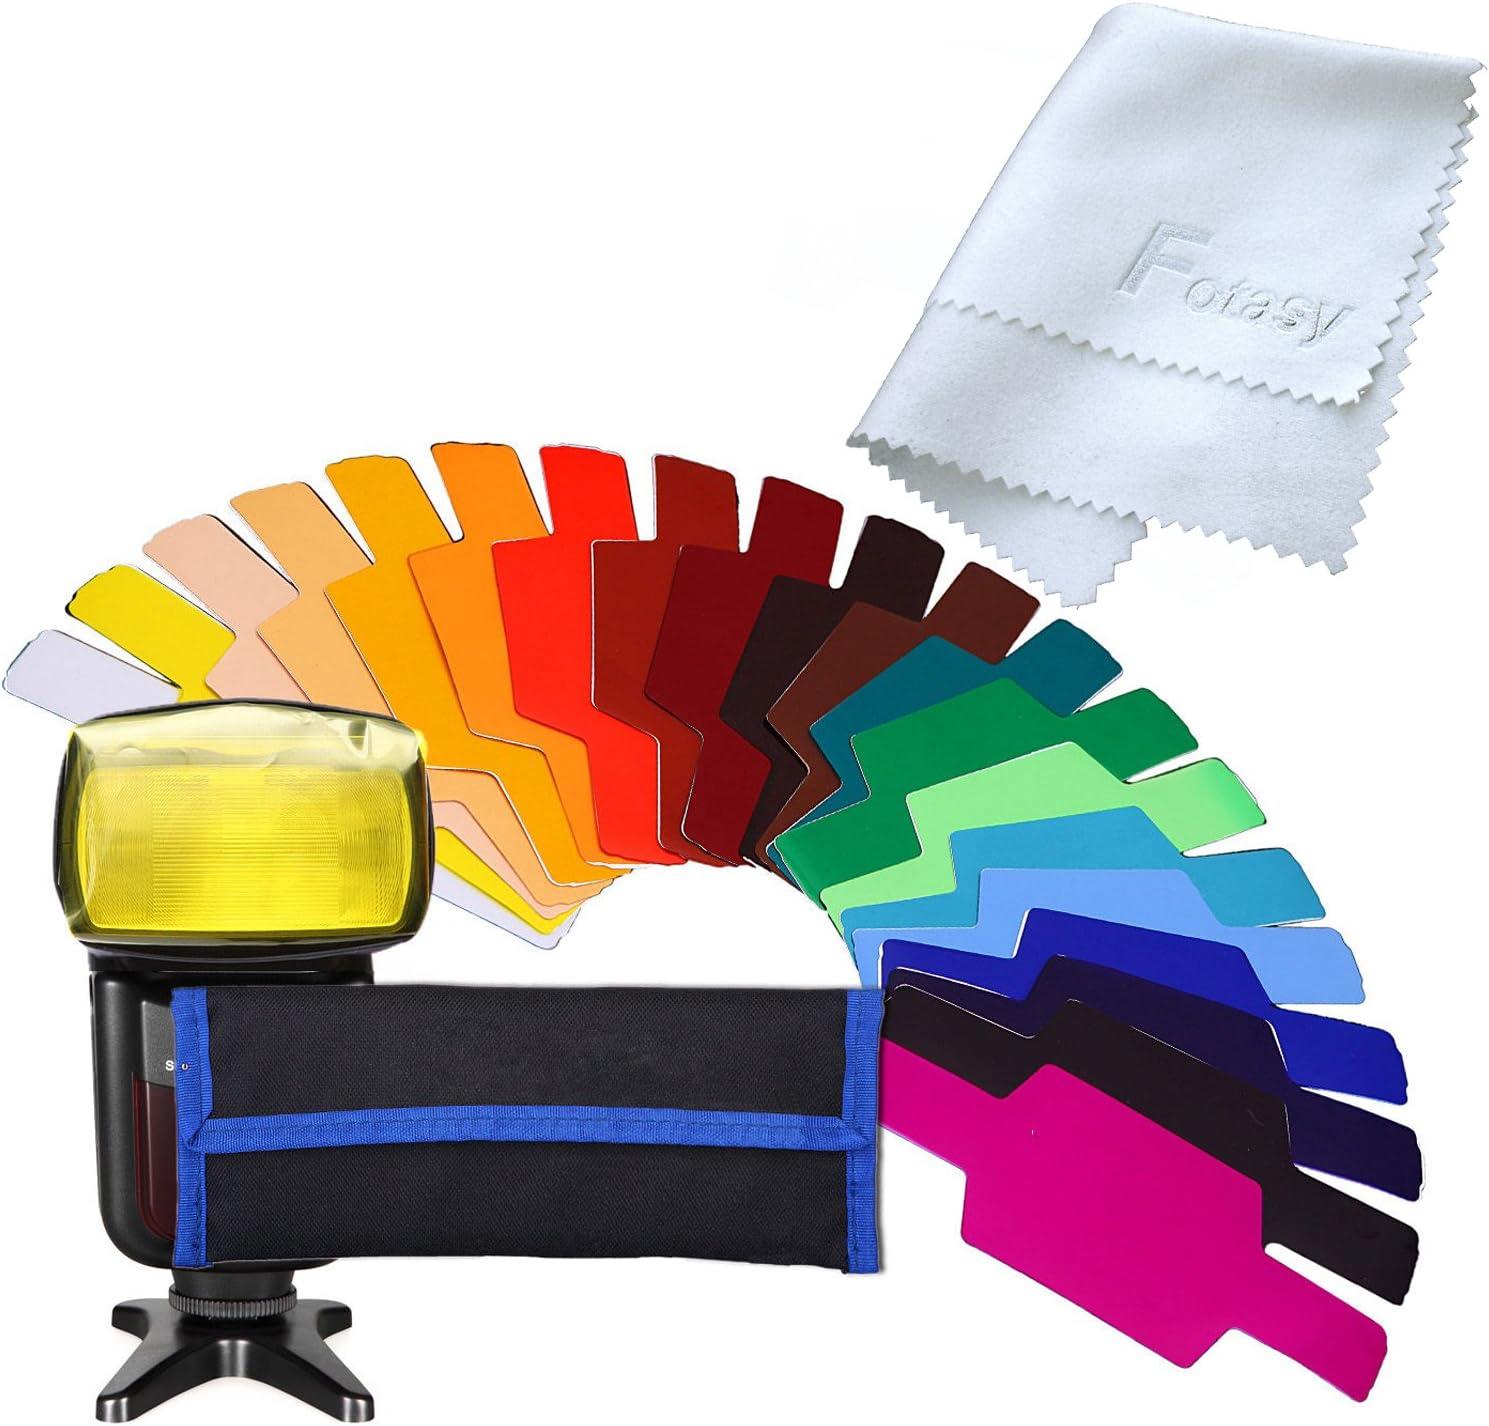 w// Gel-Band attachment Fotasy Universal Flash Gels Lighting Filter 20 pcs Combination Kit for Photo Studio Strobe Flash Light